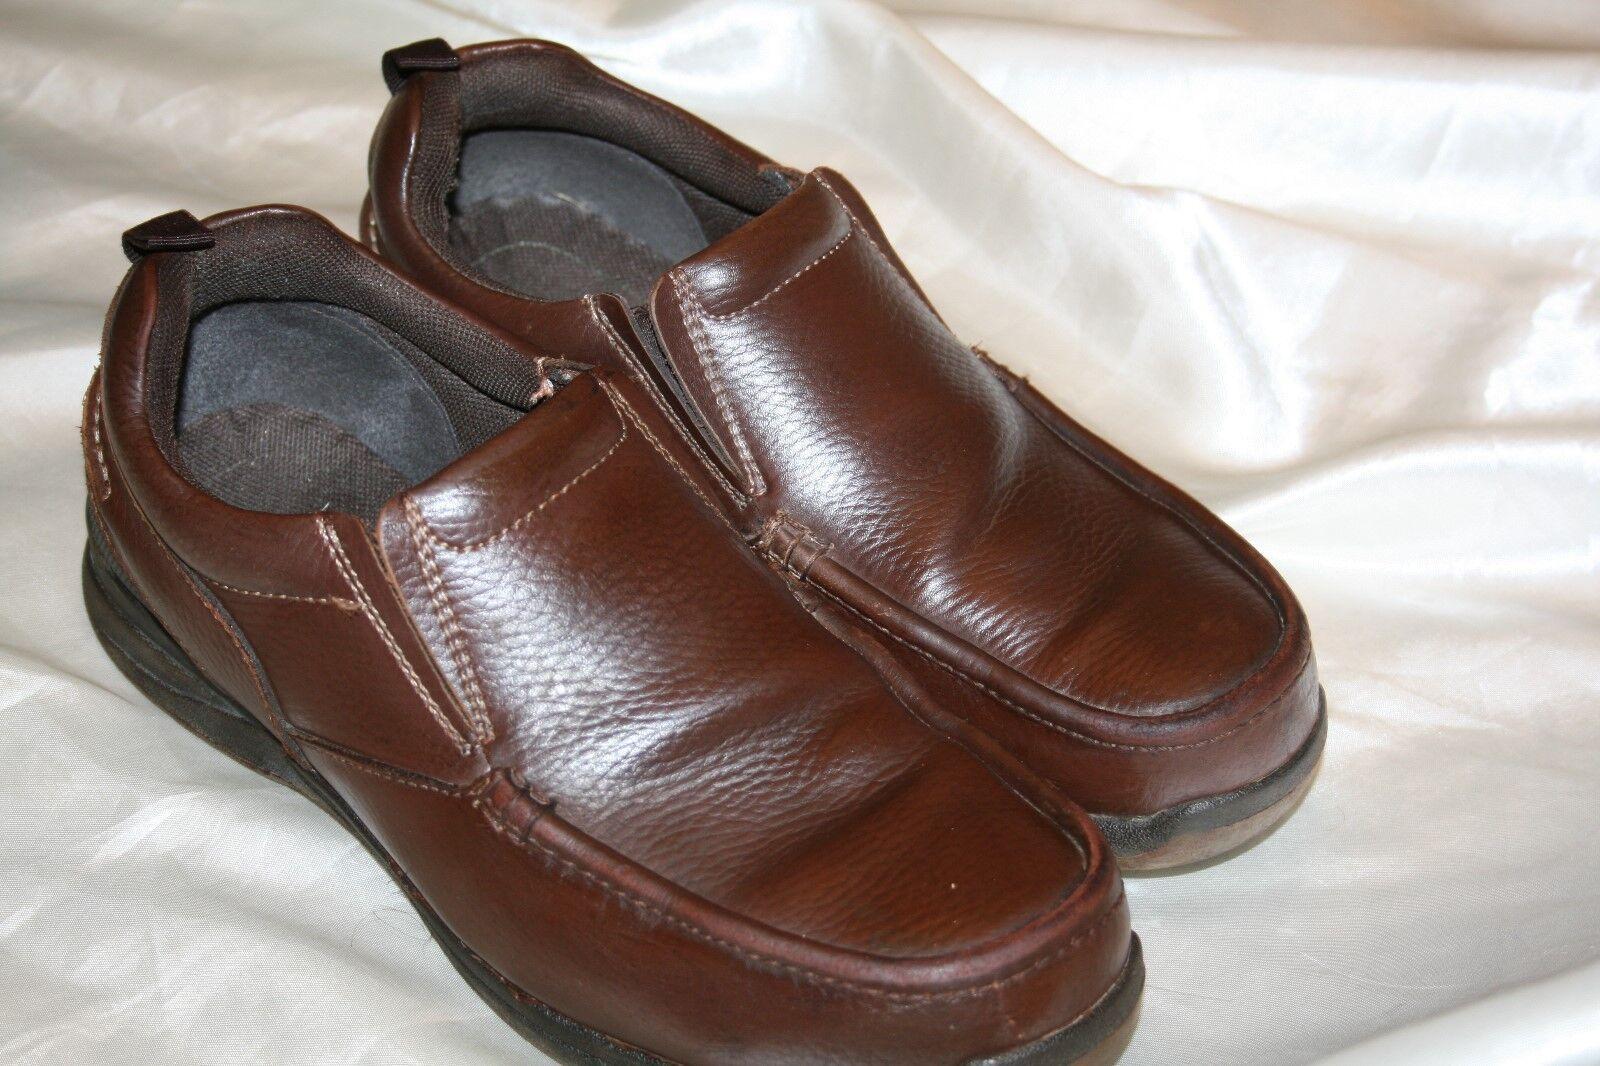 Nunn Bush Comfort Brown Leather Mens Loafer Shoes Size 8.5 M 84354-200